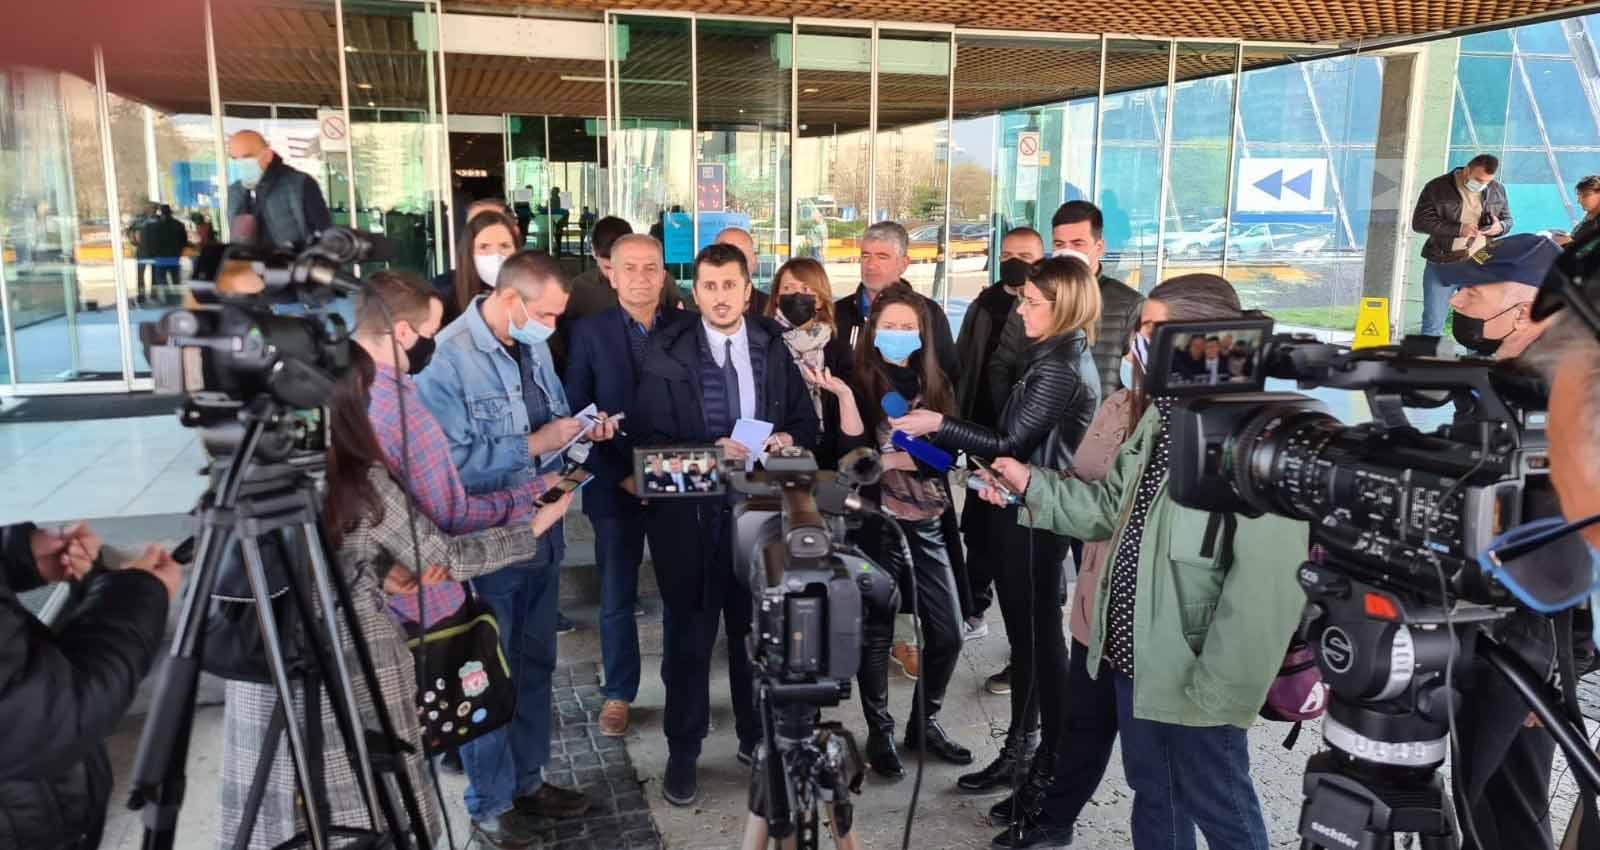 Павловић: Синиша Мали одговоран за пљачку 852 милиона динара